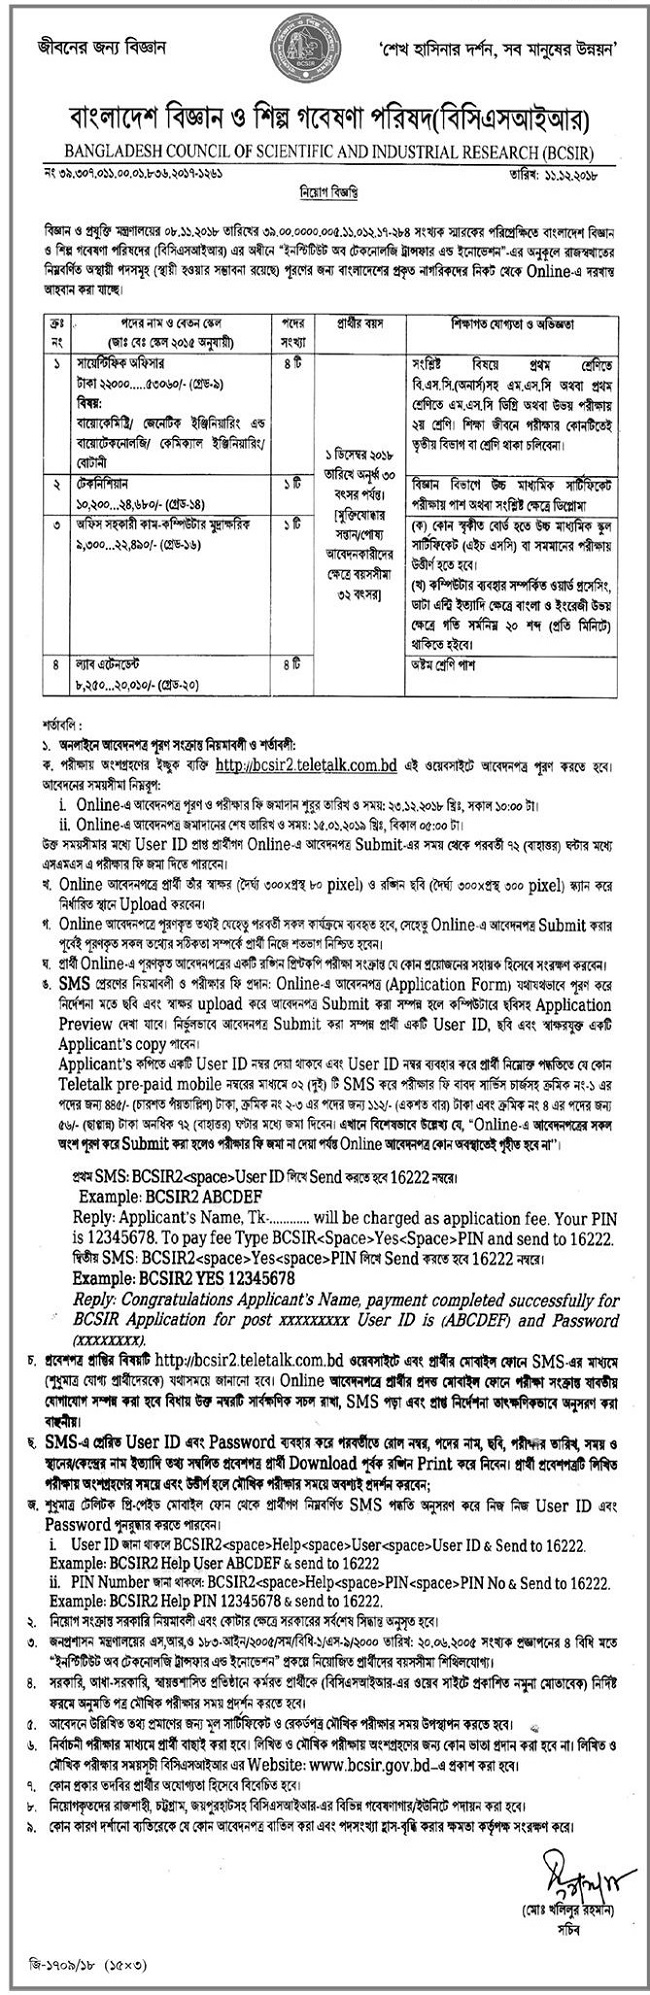 BCSIR Job Circular & Online Admit Card Download